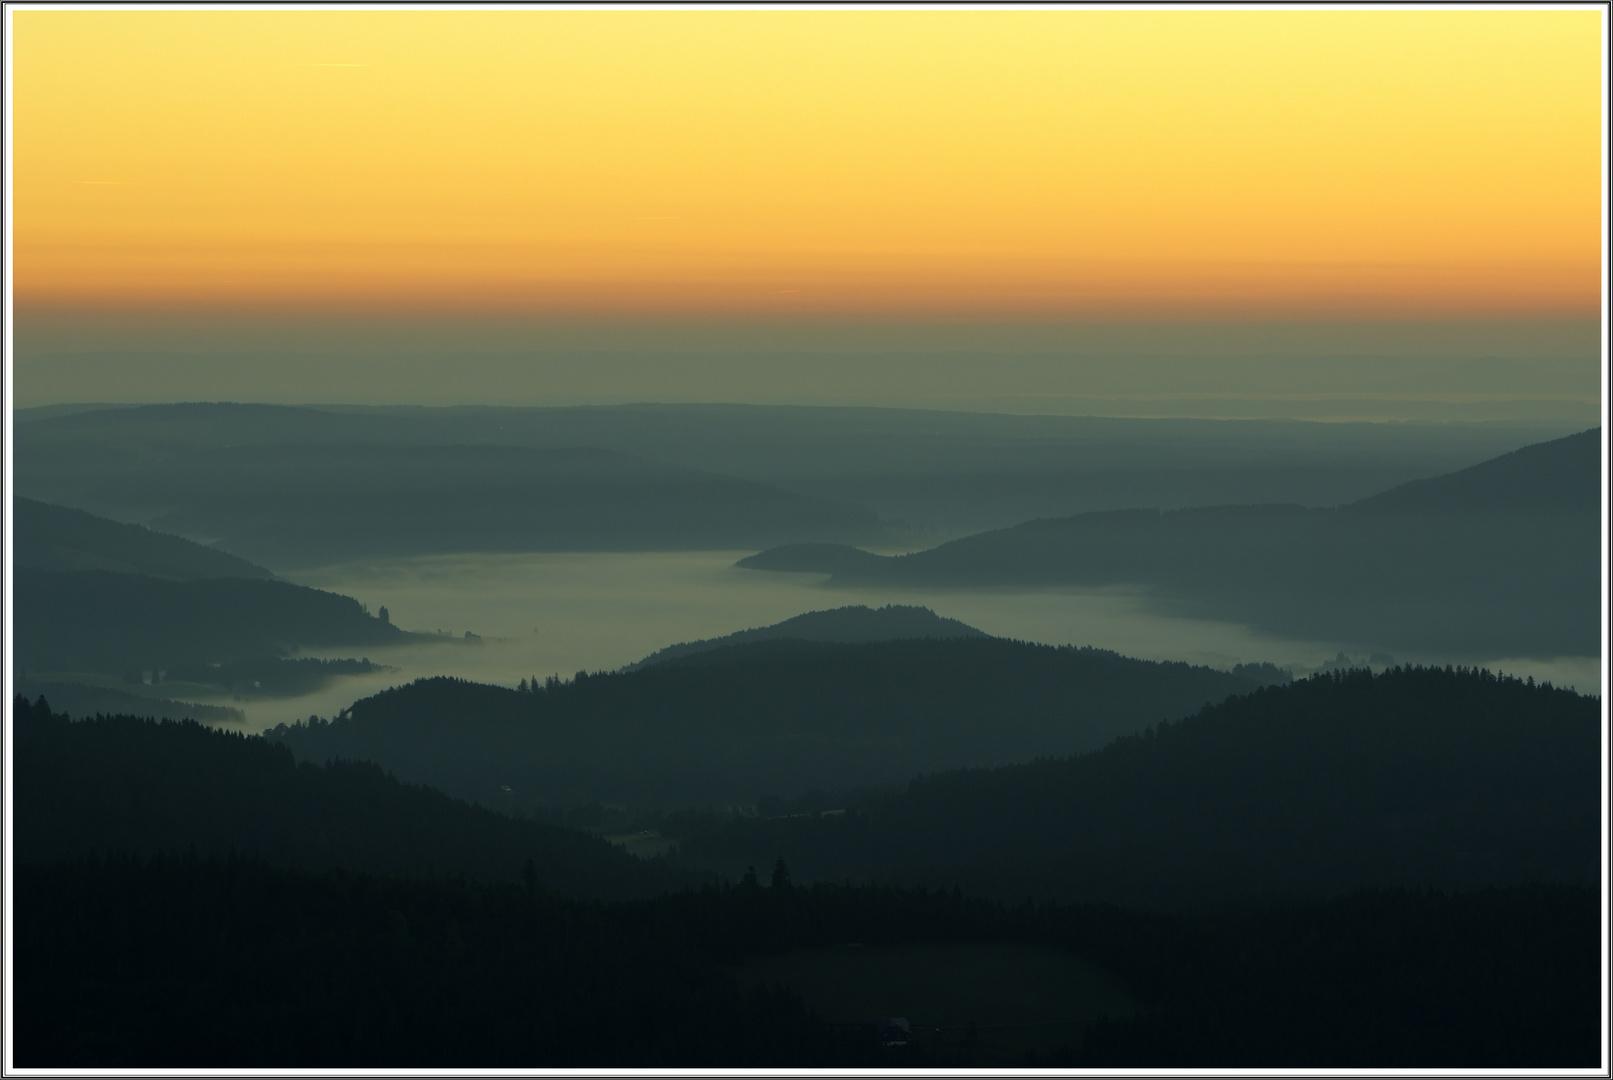 Titisee kurz vor Sonnenaufgang